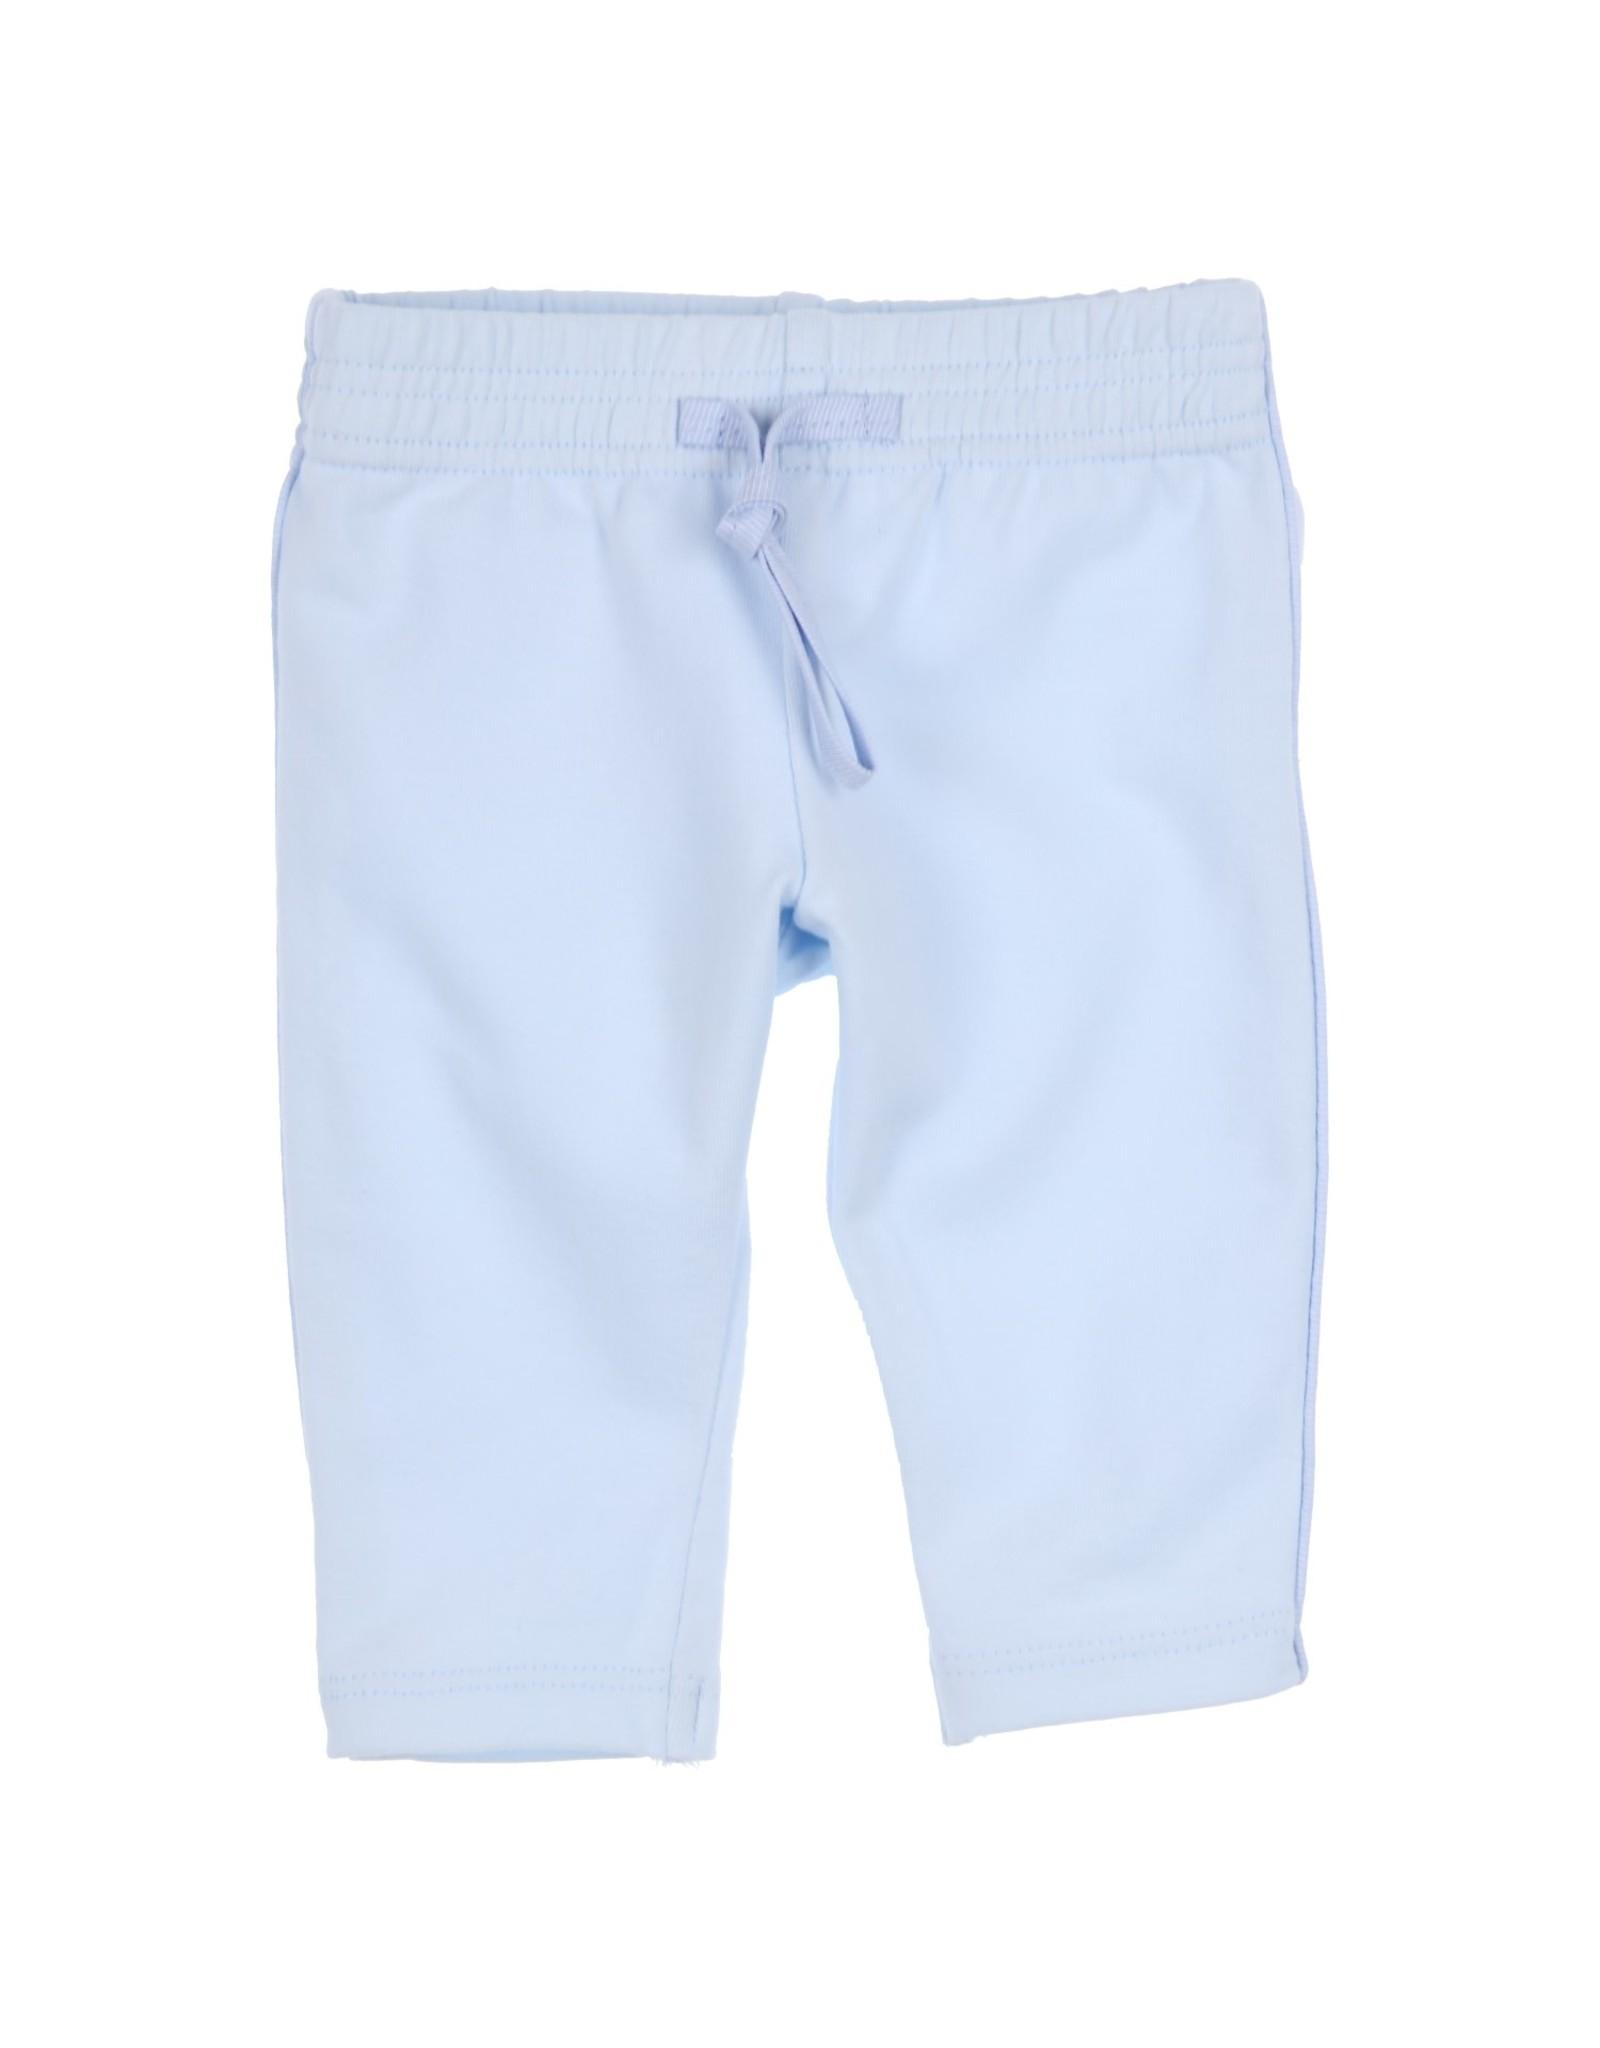 Gymp Pantalon -Passepoil And Pocket Lichtblauw